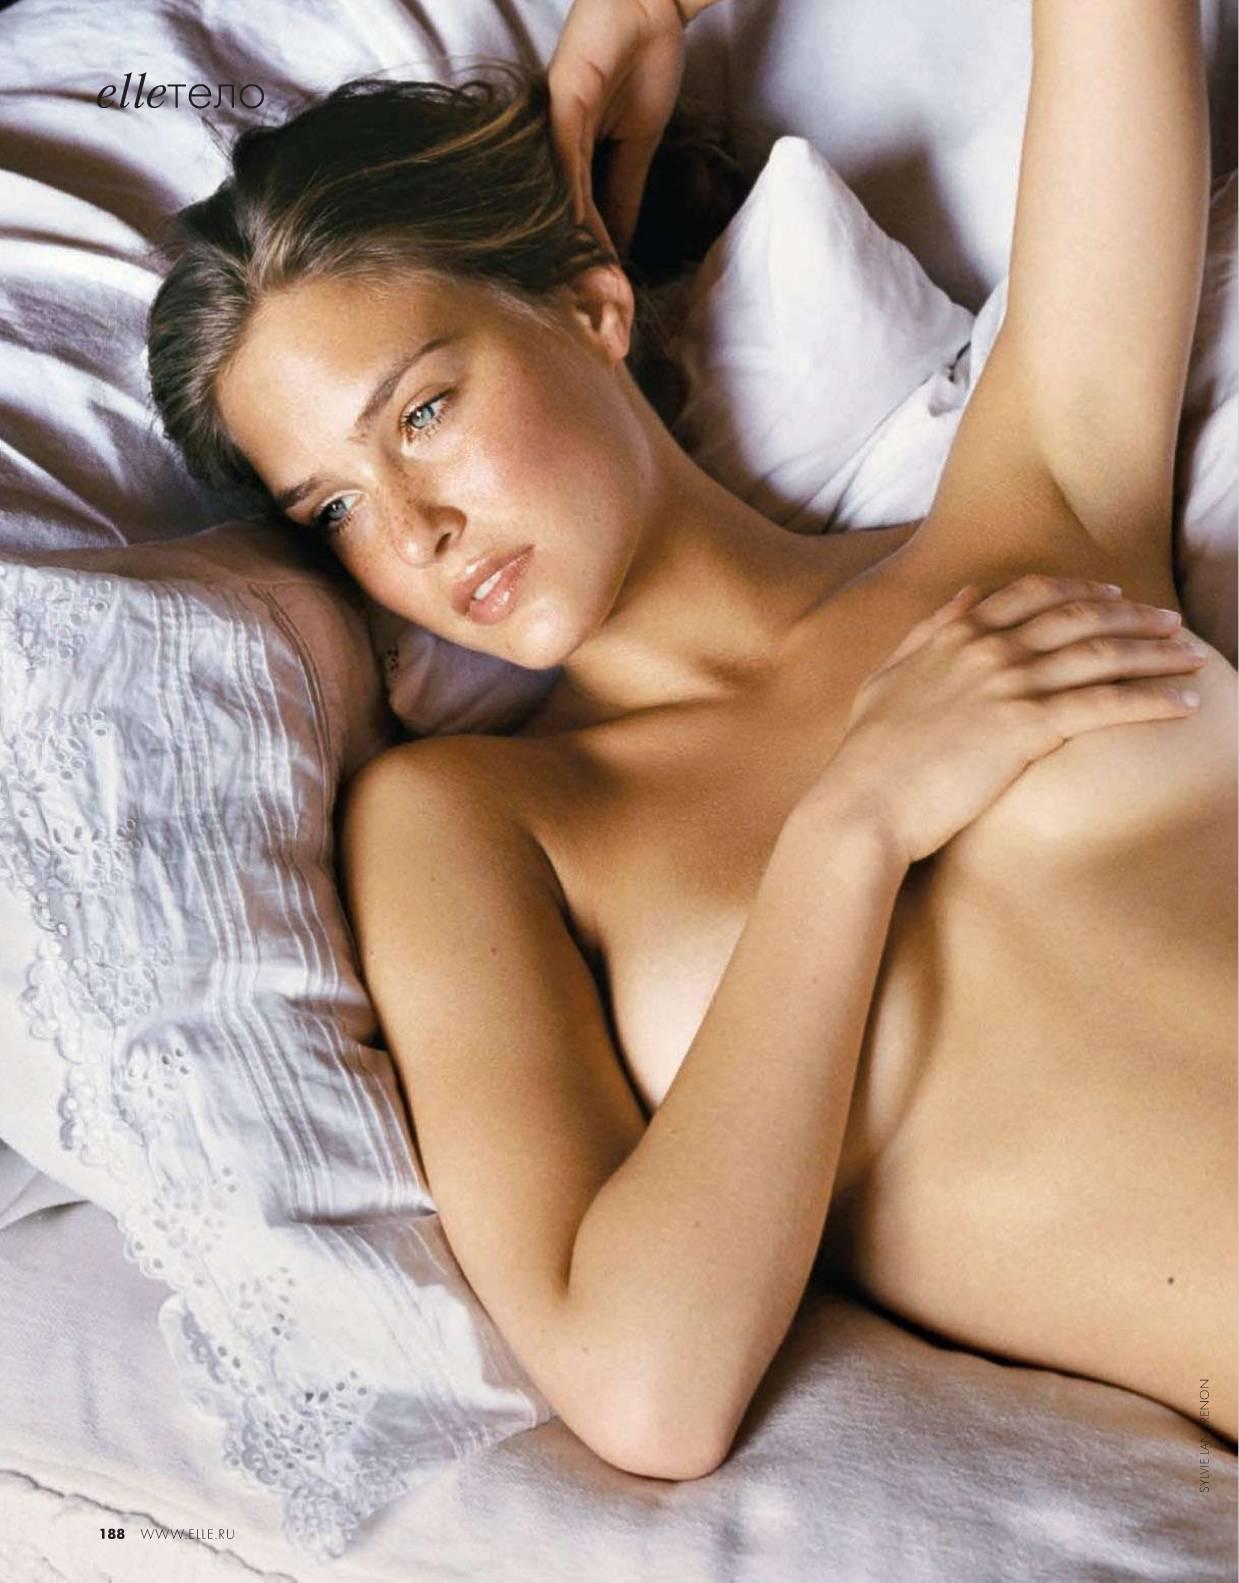 http://2.bp.blogspot.com/_HshTMYttcWs/S6n8LF06VZI/AAAAAAAAFcI/OY6ti8j8W1w/s1600/Bar_Refaeli_naked.jpg